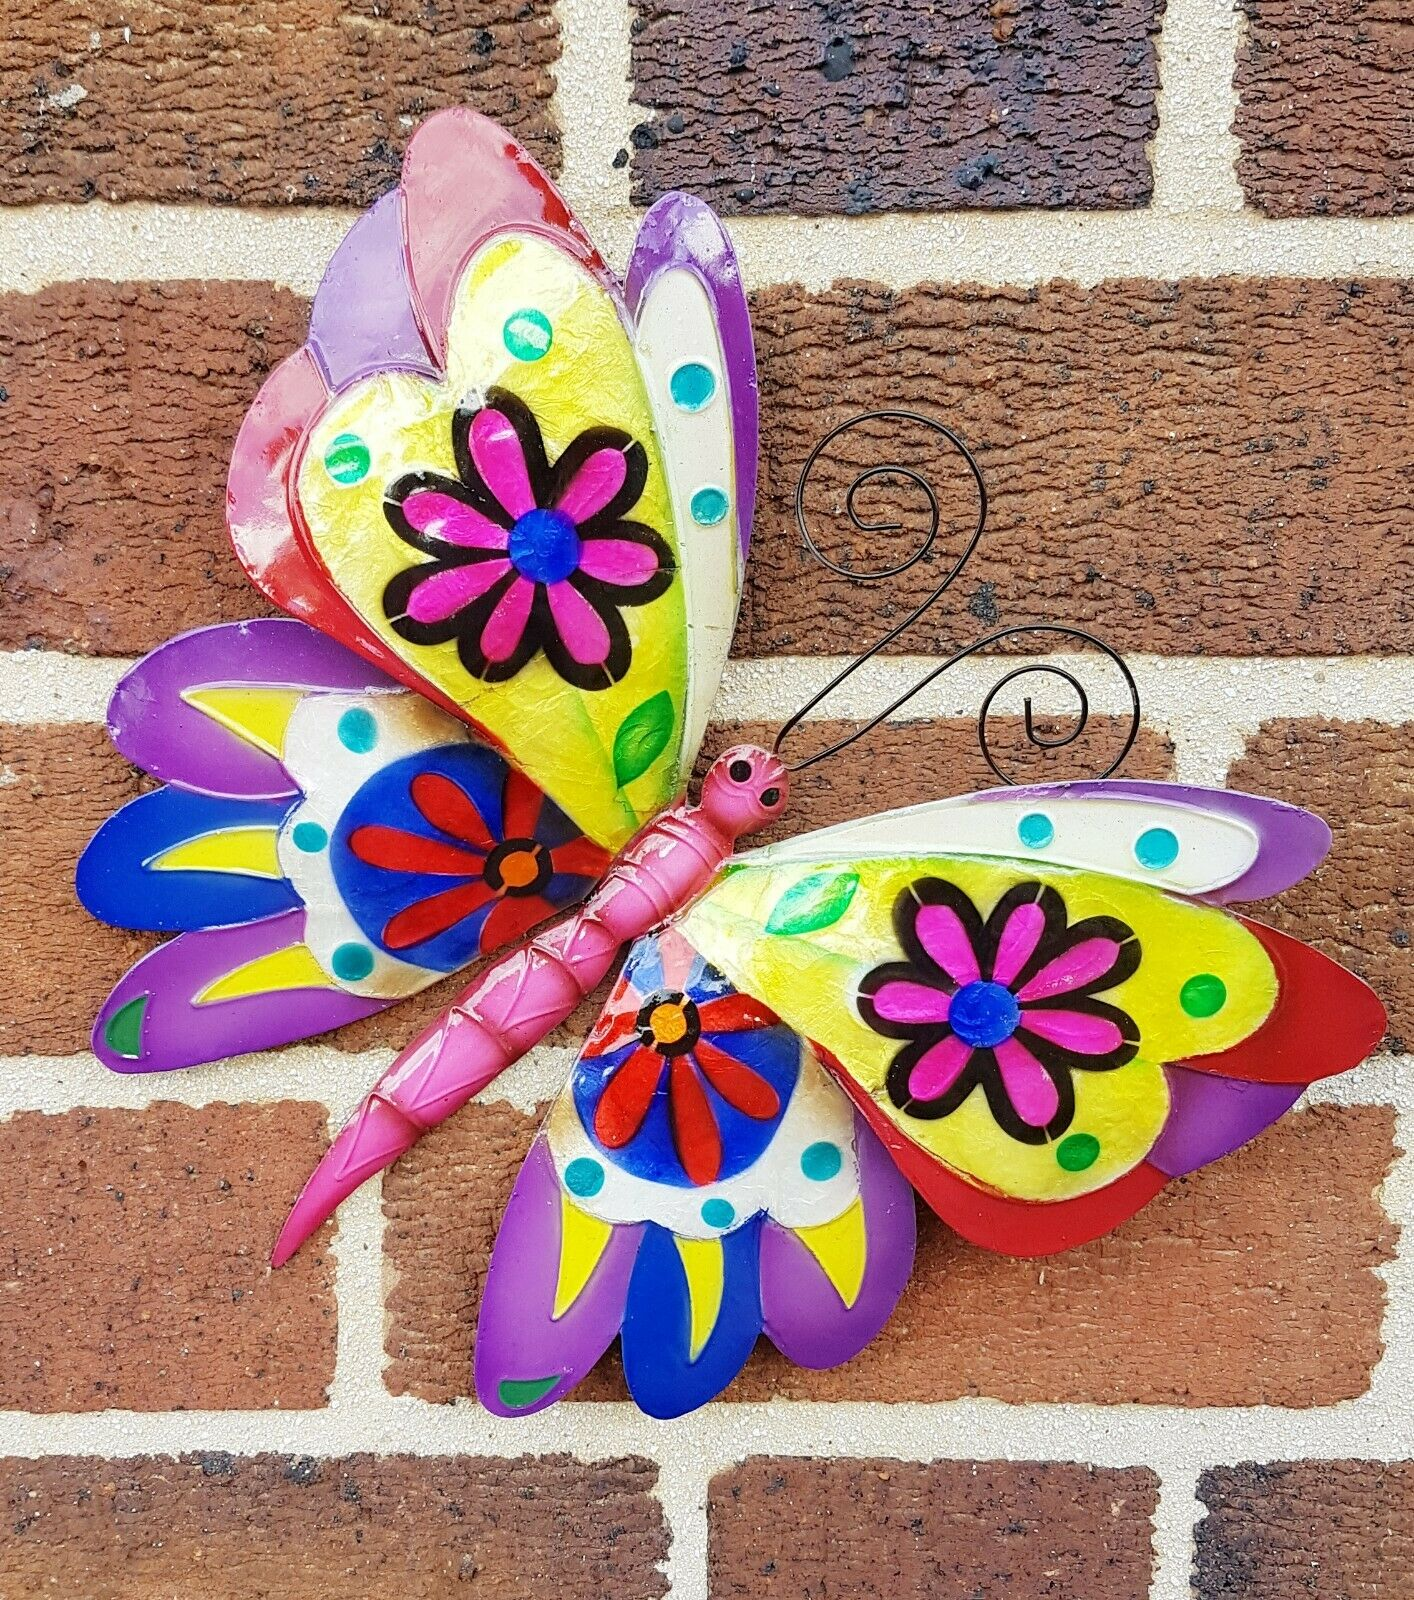 Butterfly wall art hand made metal garden decoration unique gifts fair trade